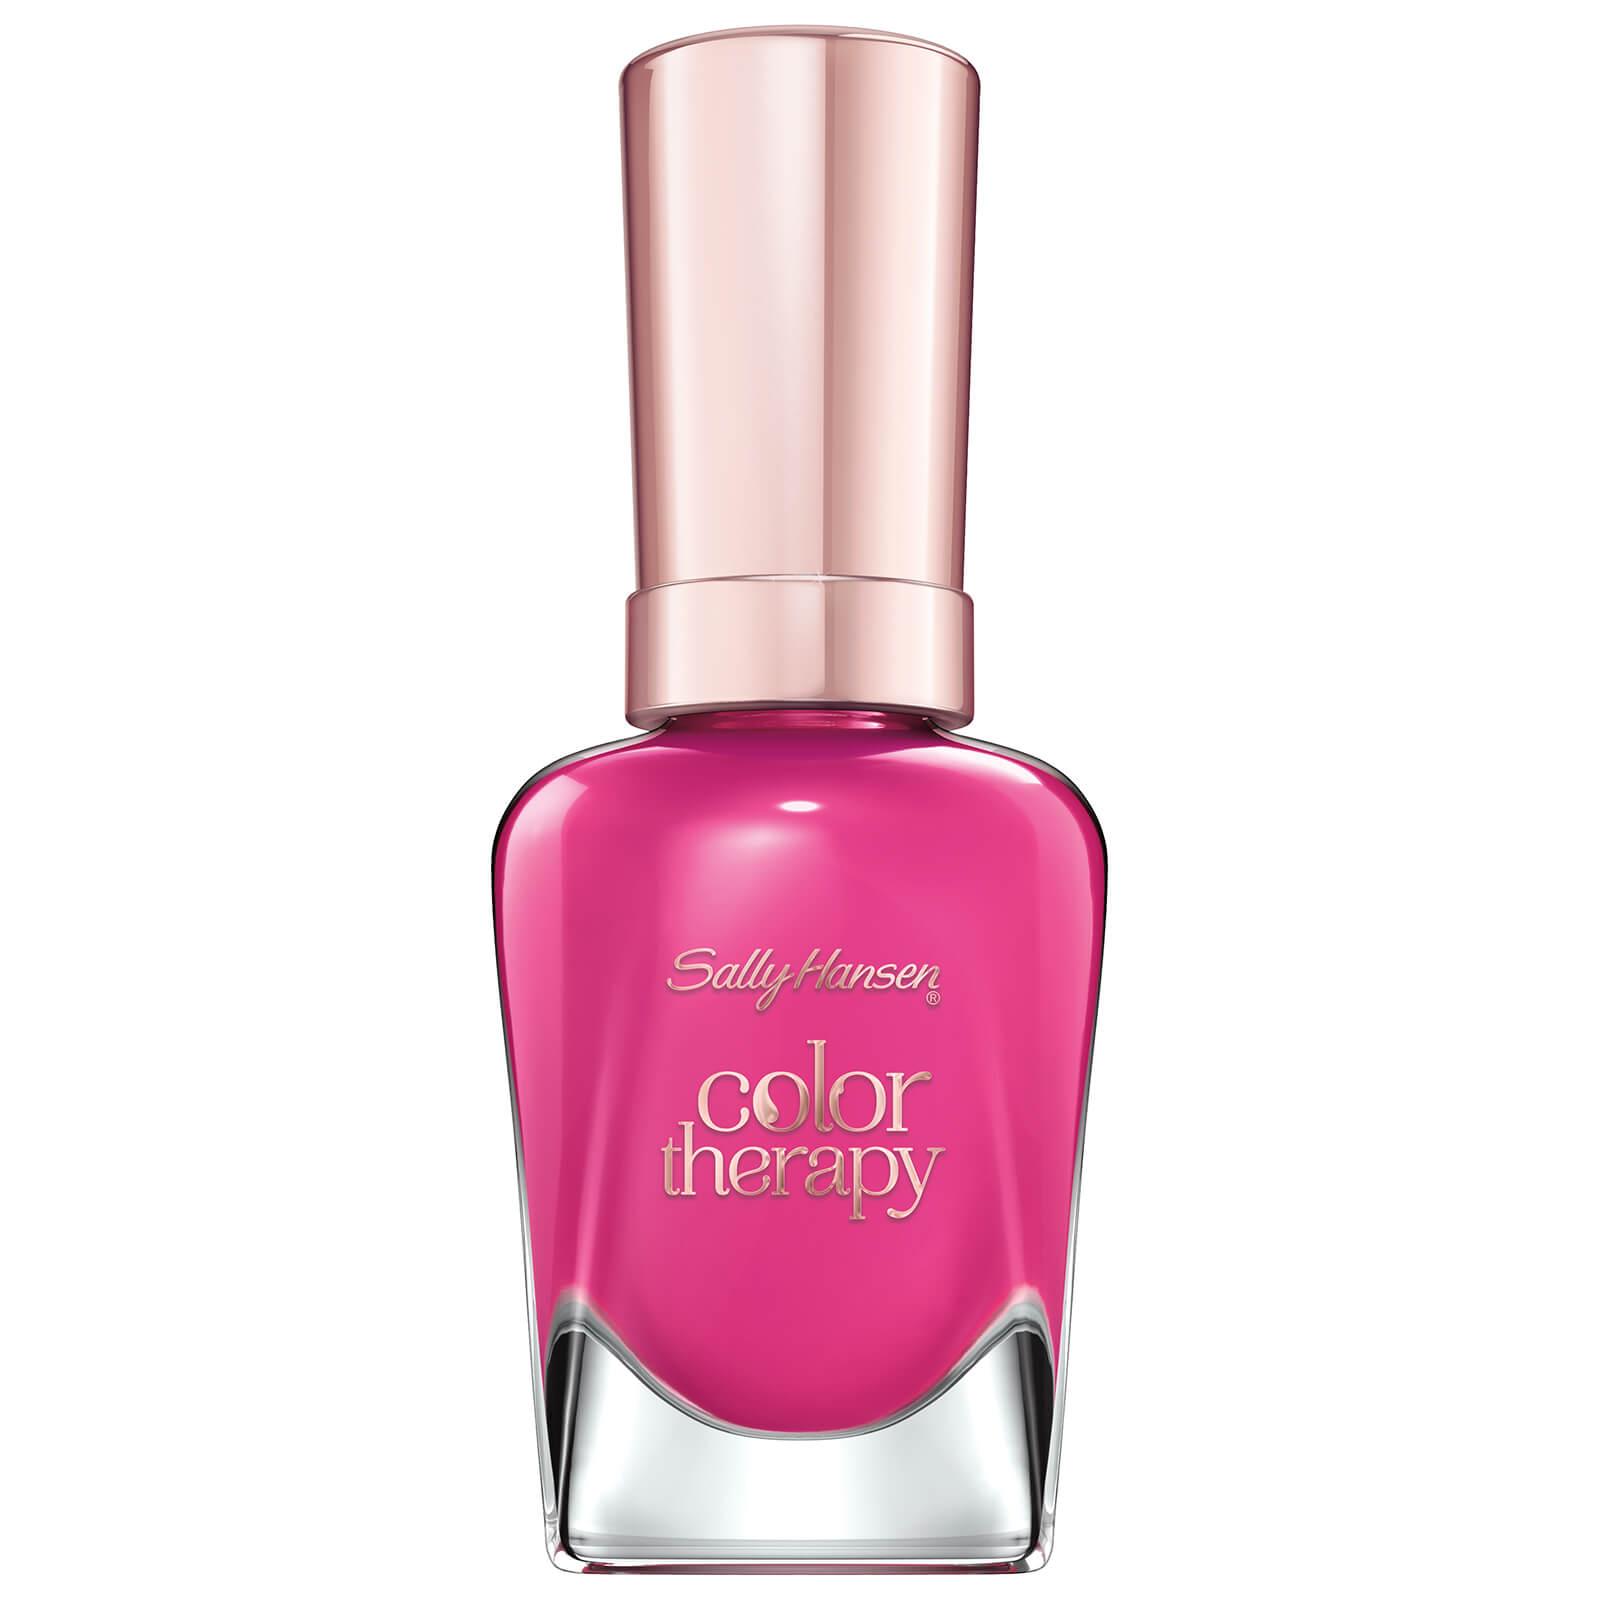 Sally Hansen Colour Therapy Nail Polish 14.7ml - Berry Smooth